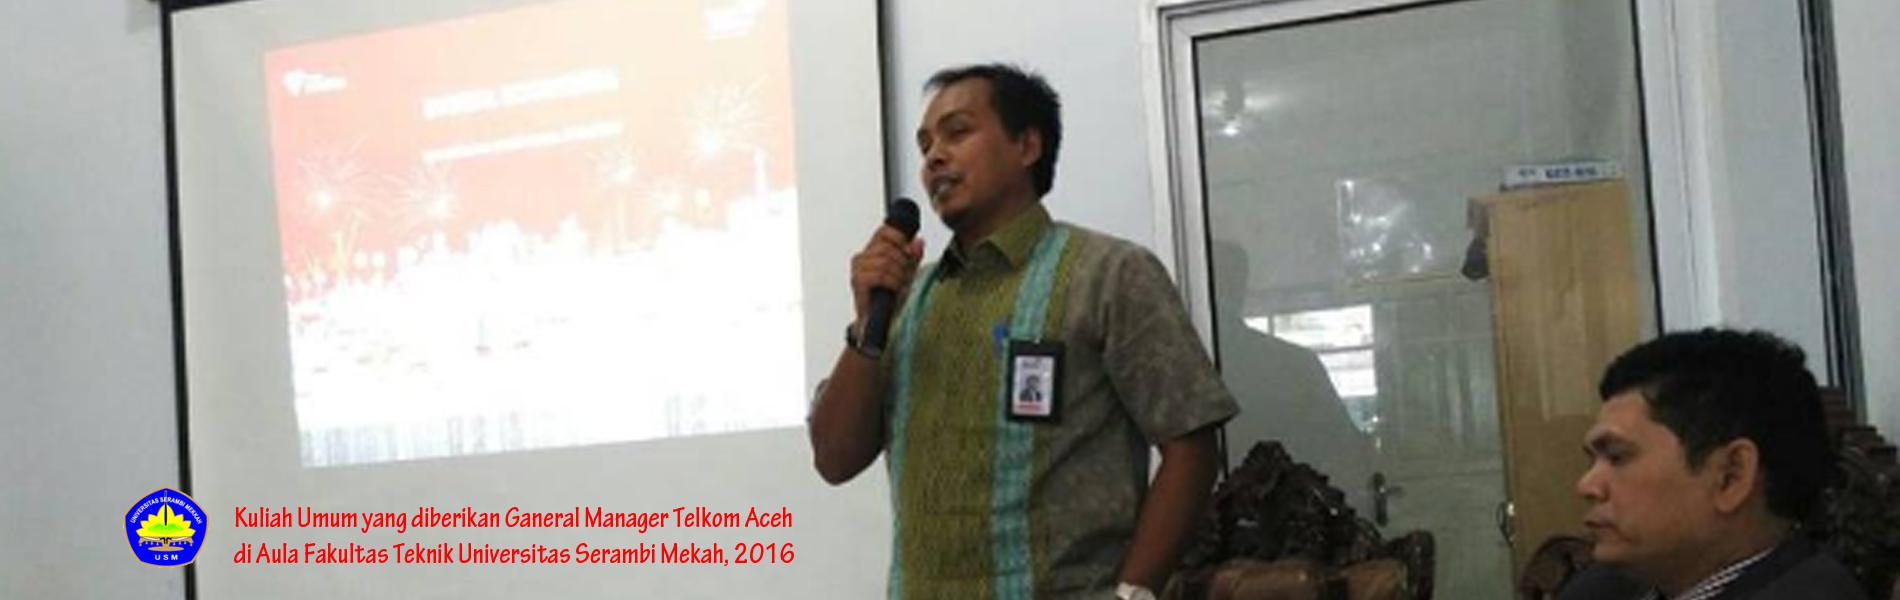 Kuliah Umum General Manager Telkom Aceh